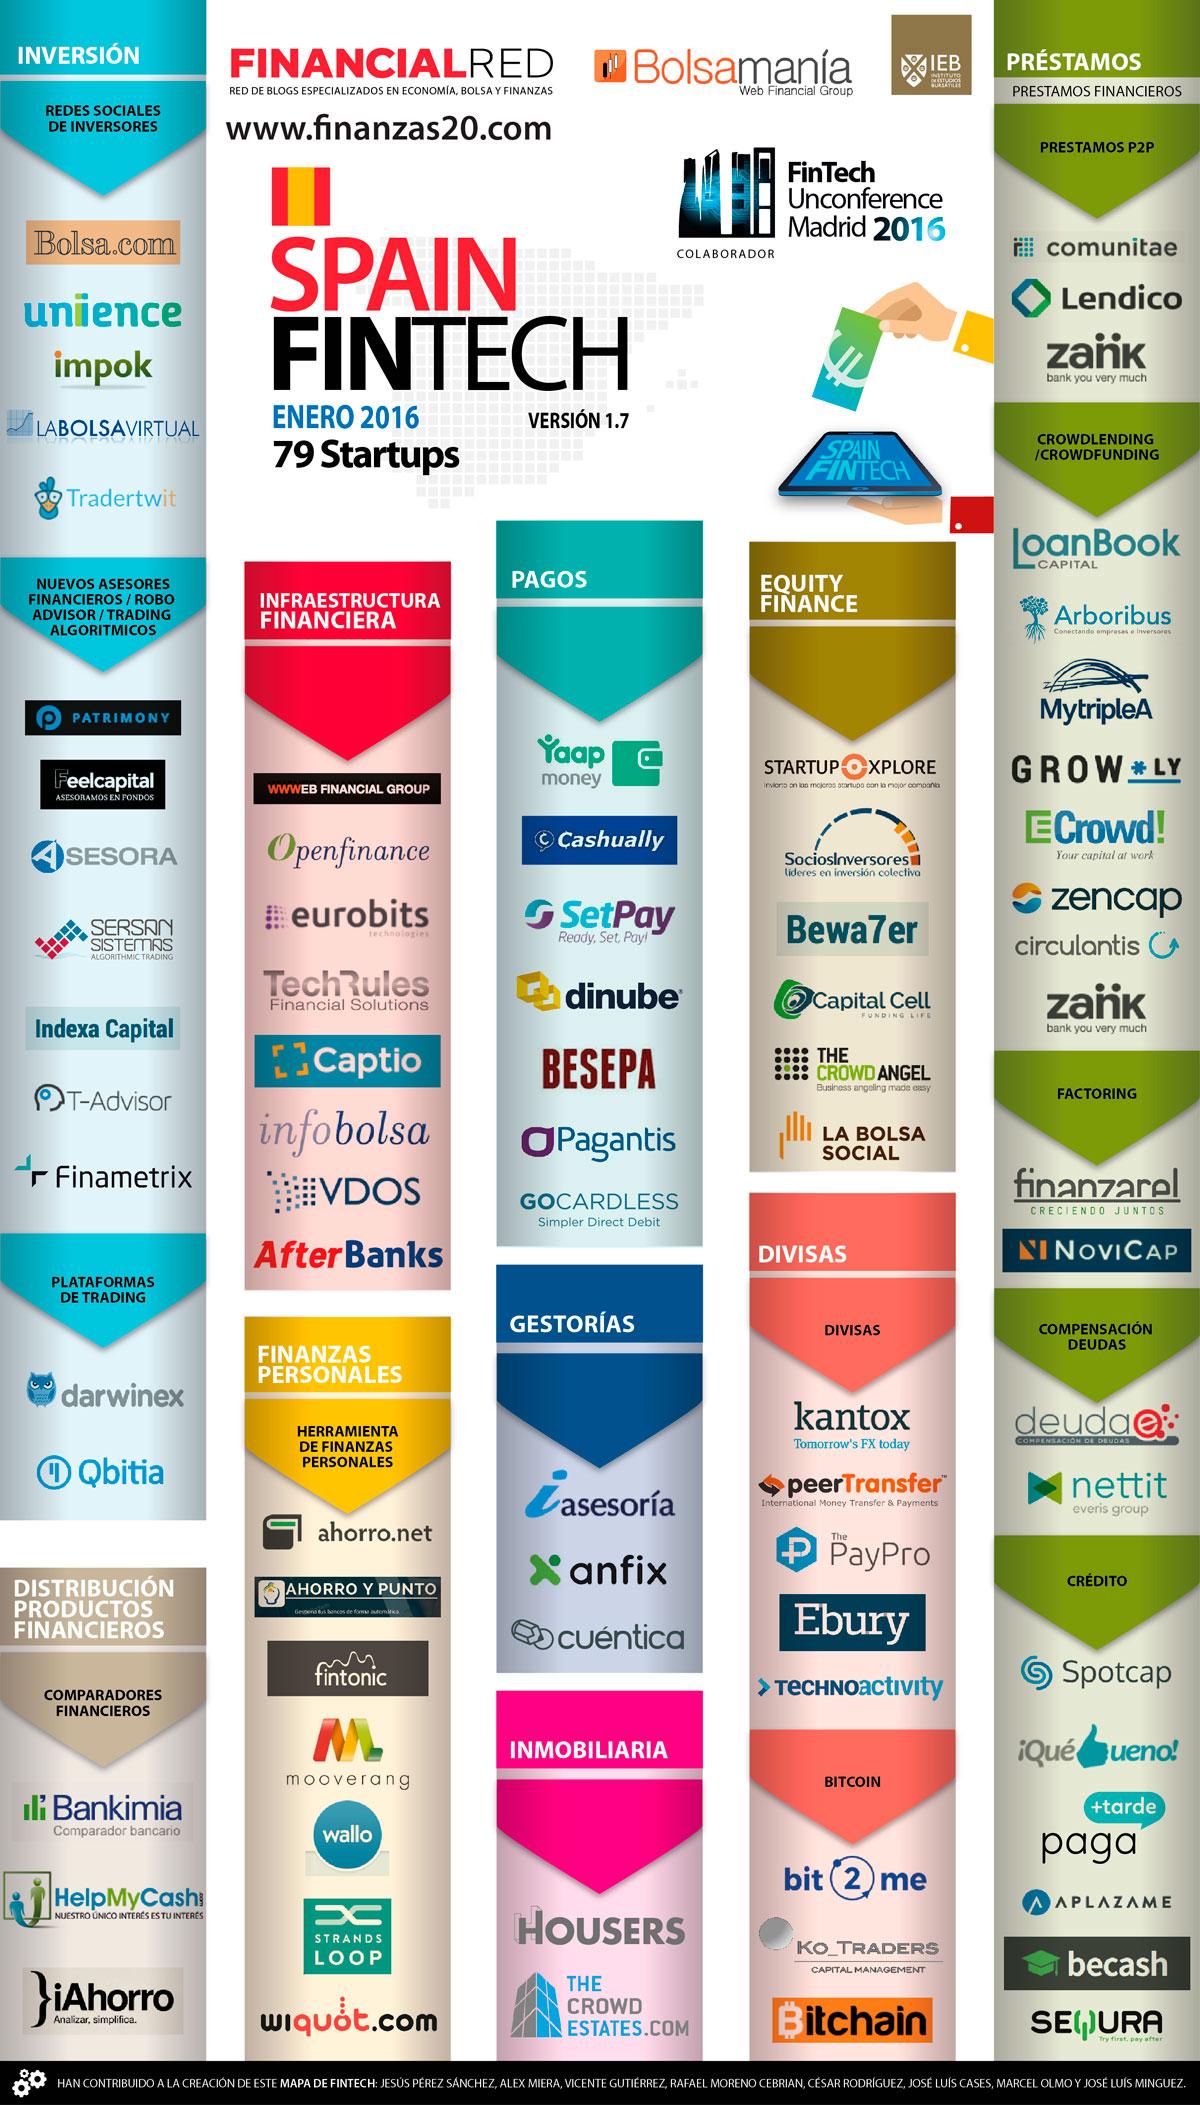 Infografía participantes Fintech Unconference